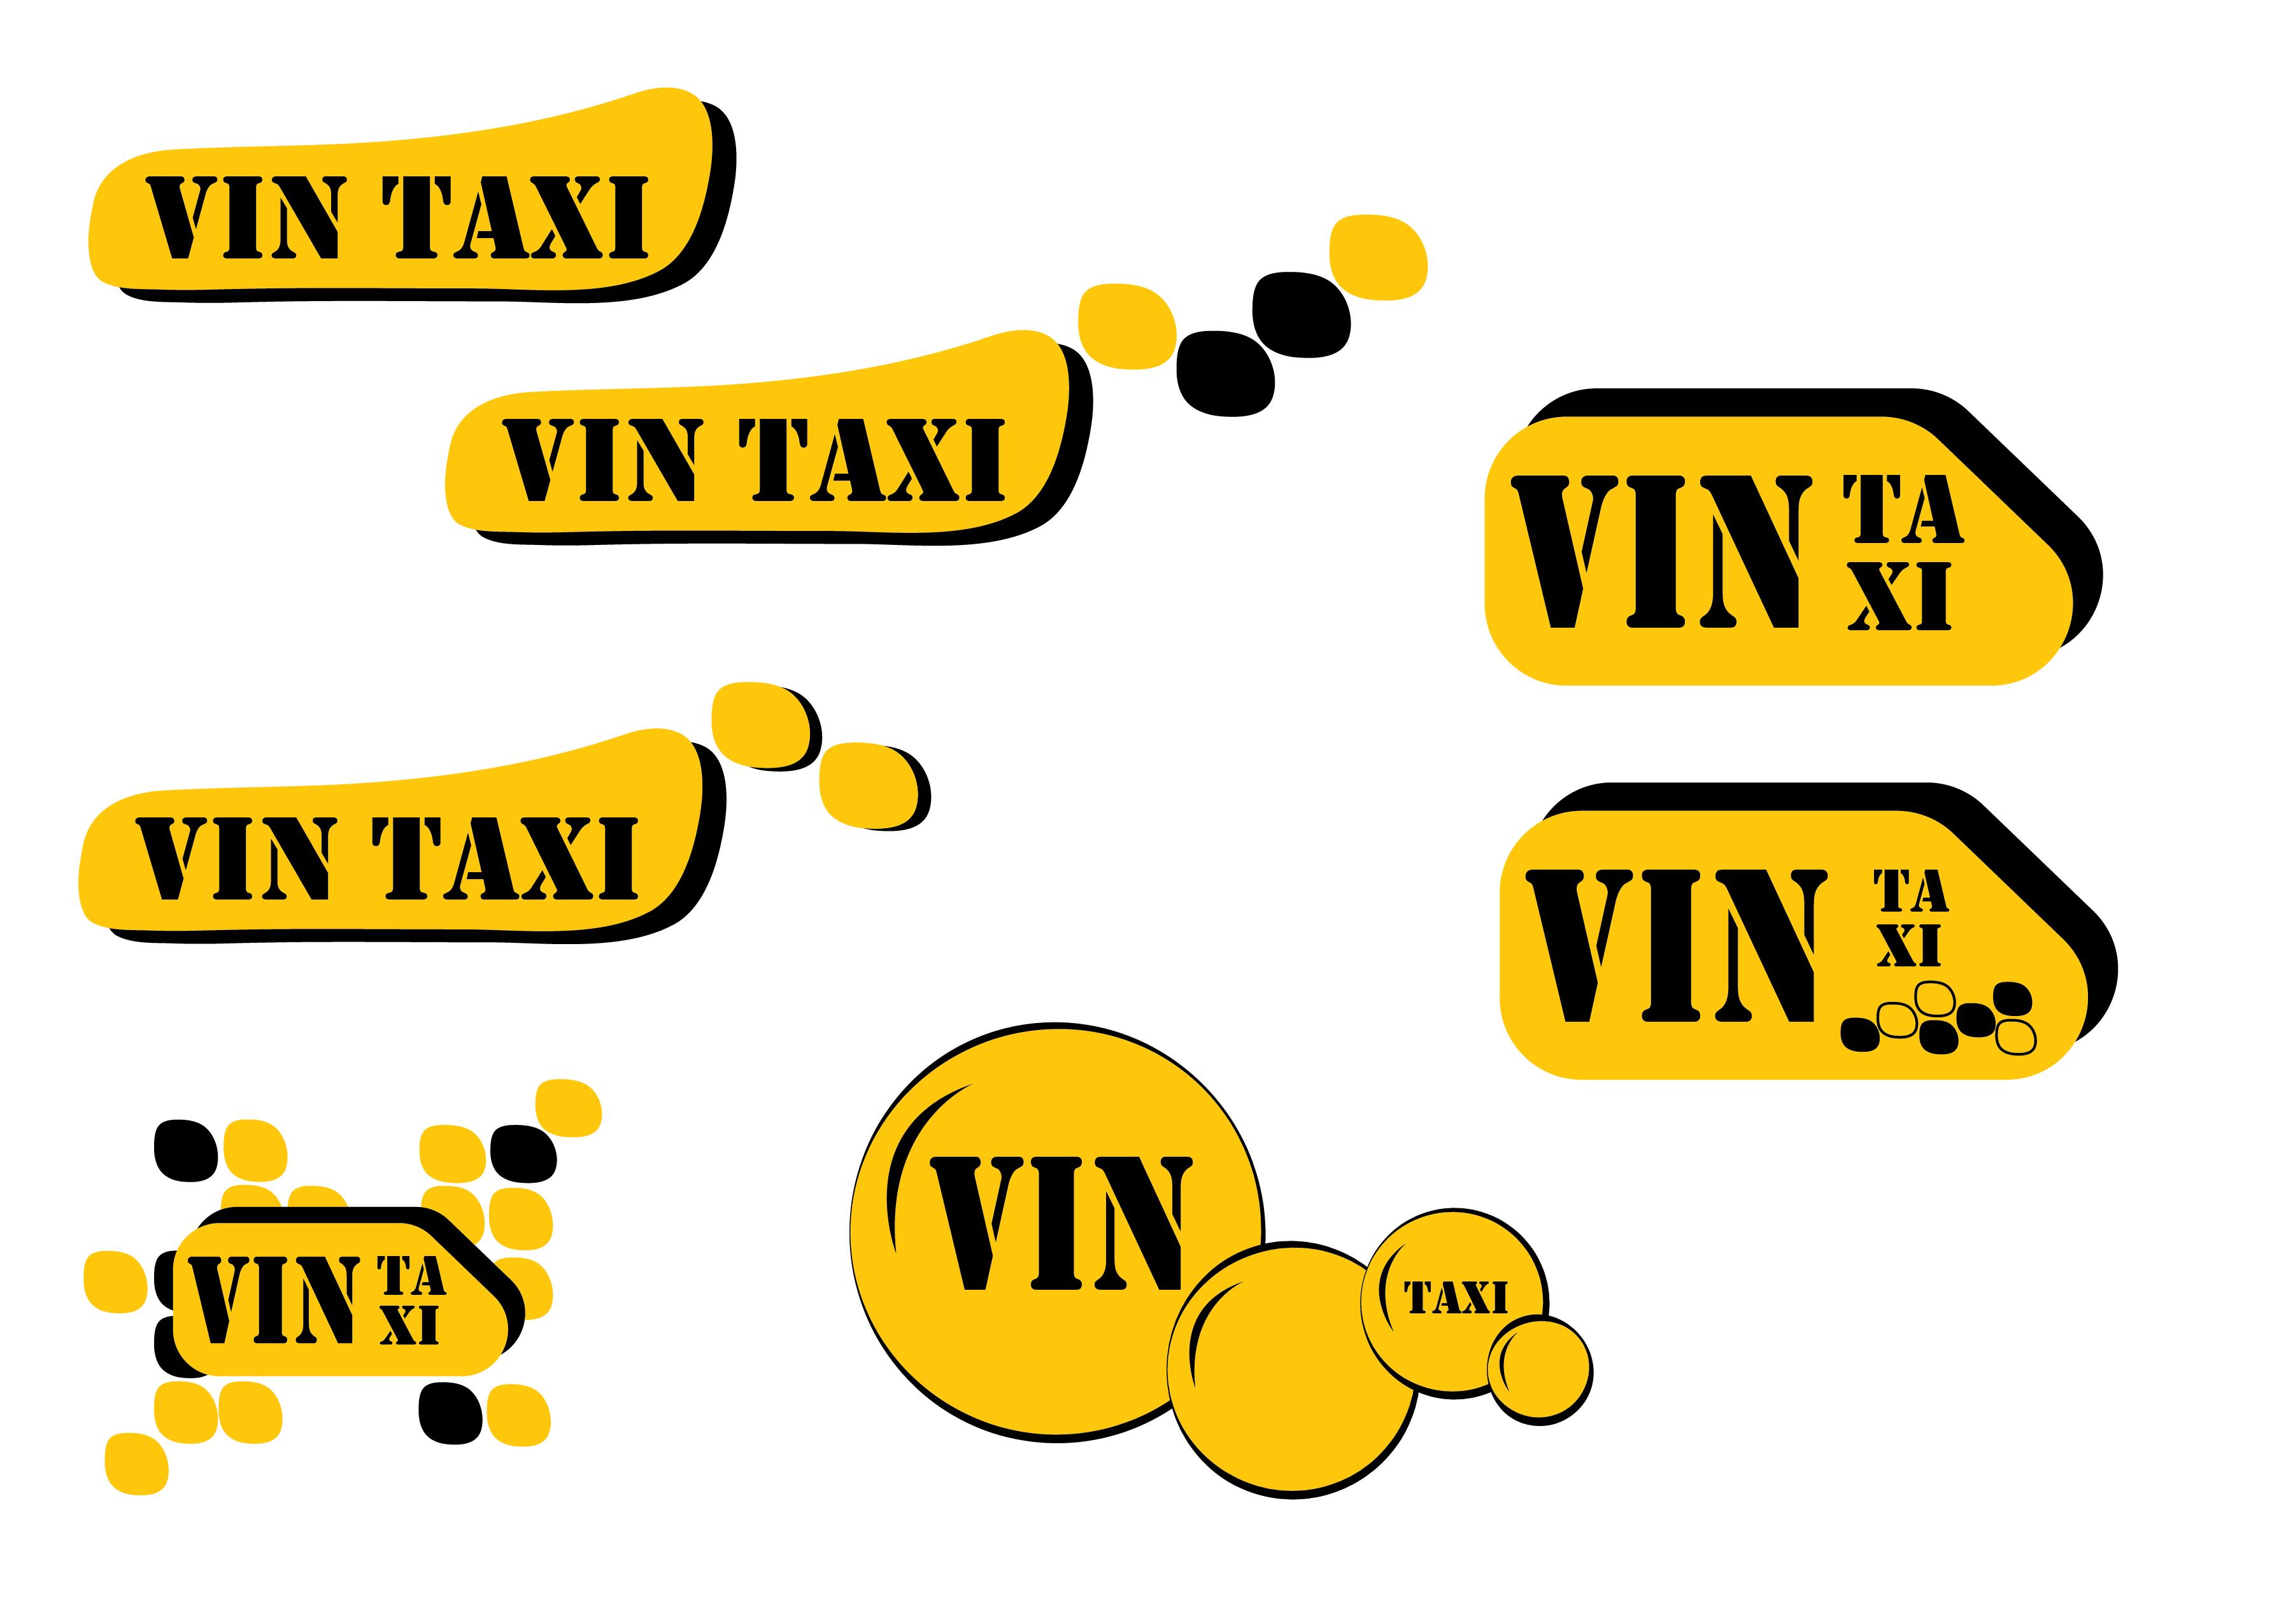 Разработка логотипа и фирменного стиля для такси фото f_2365b9eb7c905589.jpg